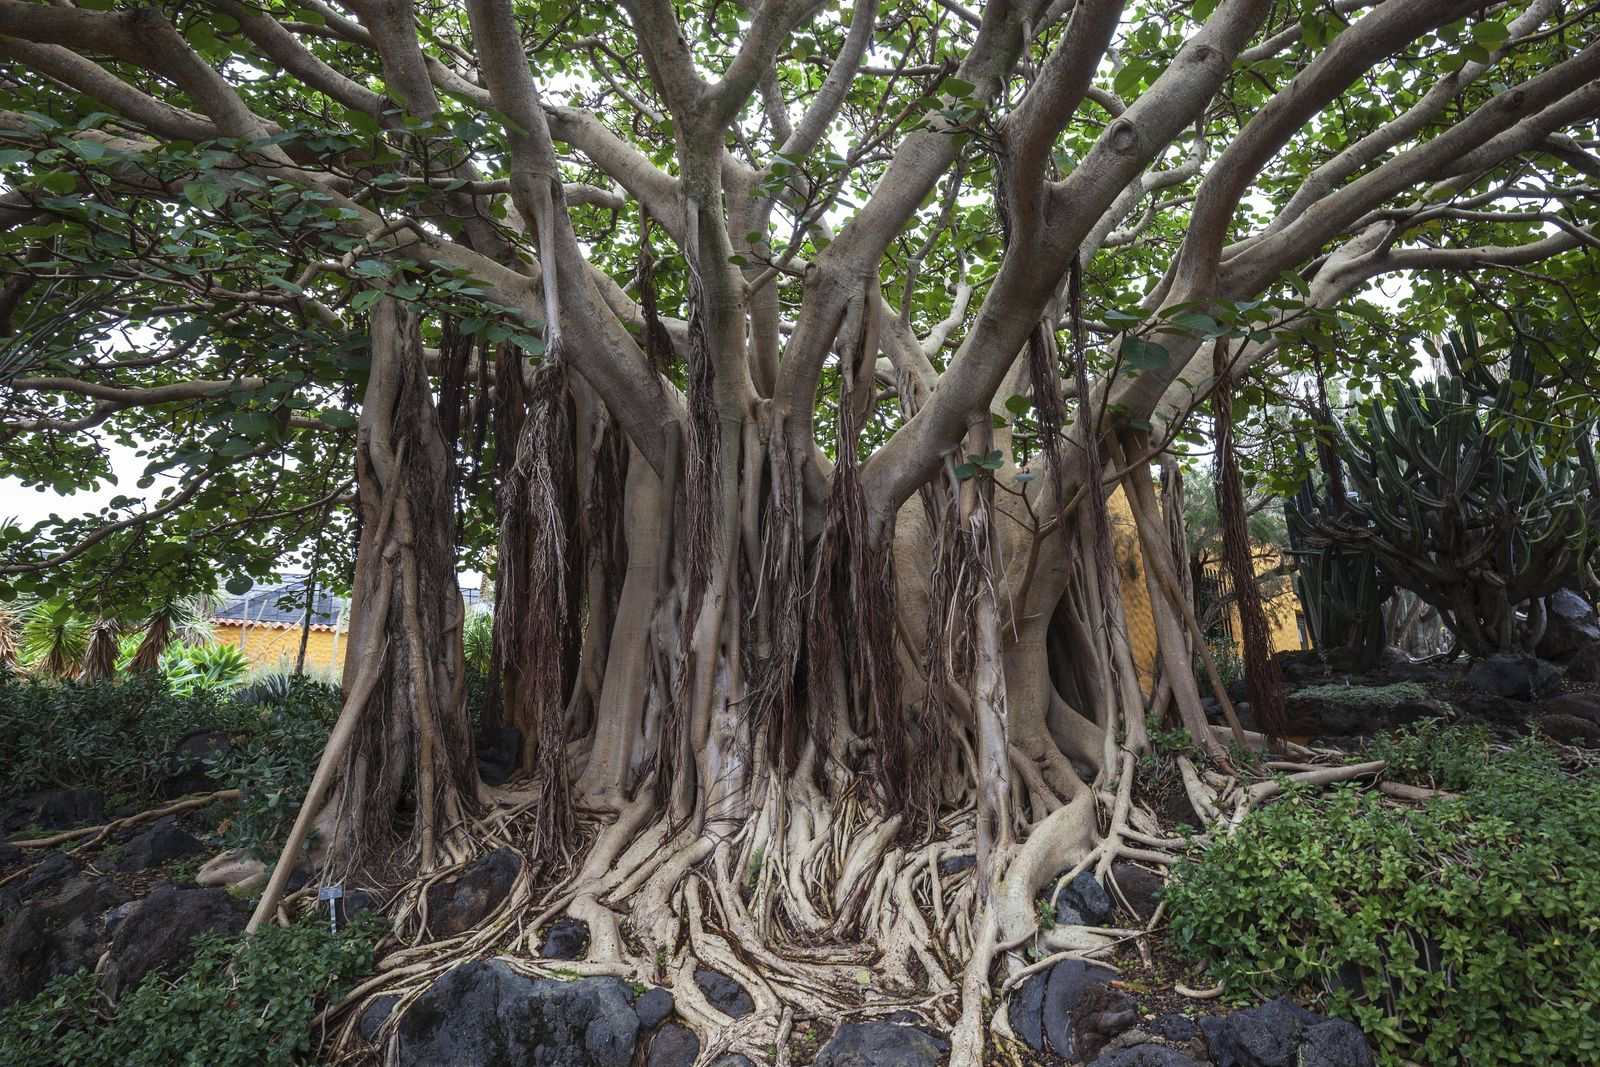 Wurzeln Sokotra Maulbeerbaum Ficus socotrana botanischer Garten Jardin Botanico Canario Viera y